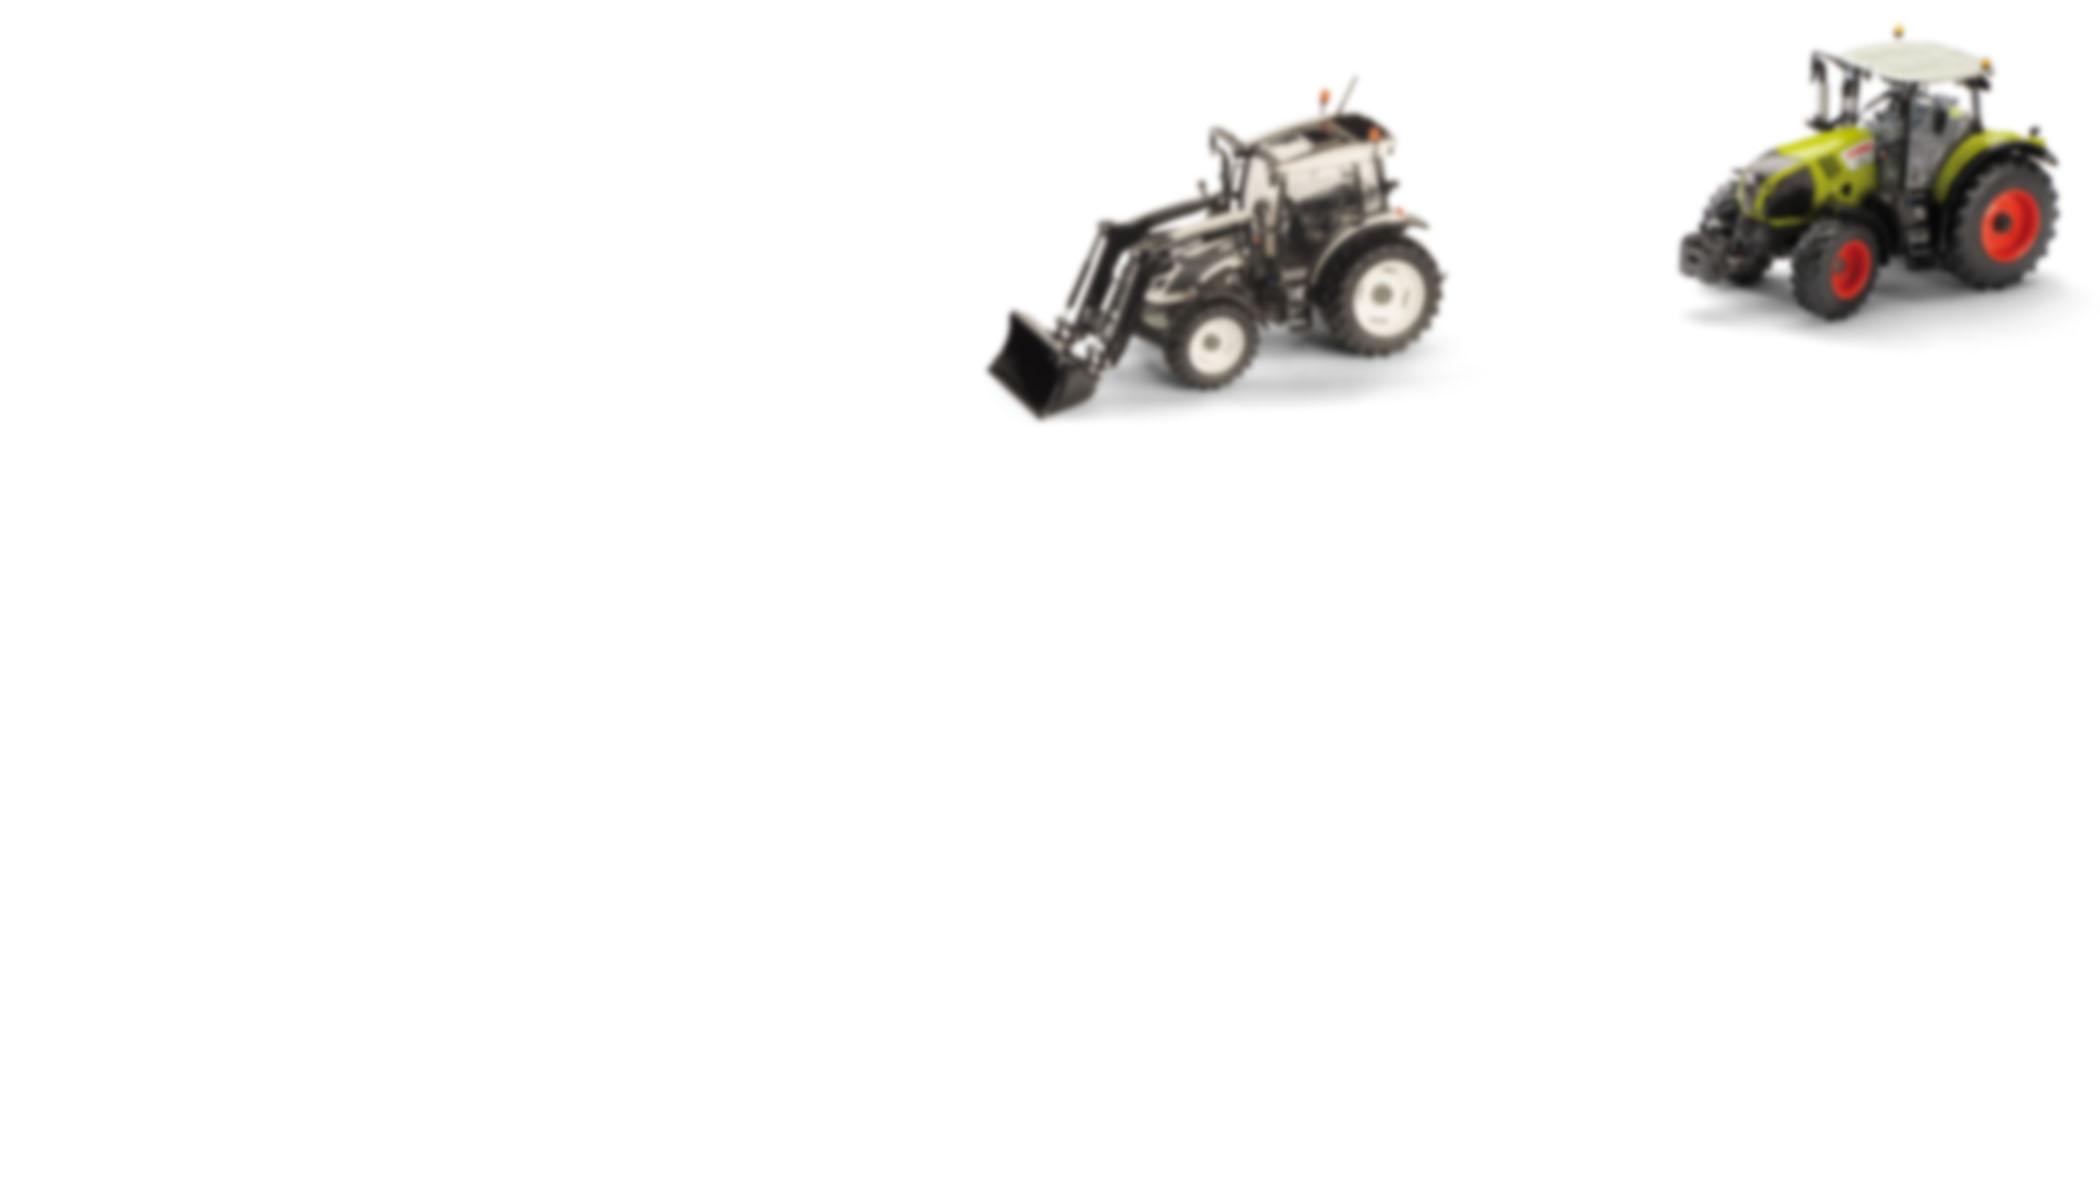 Produttore di modellini di trattori di altissima qualità